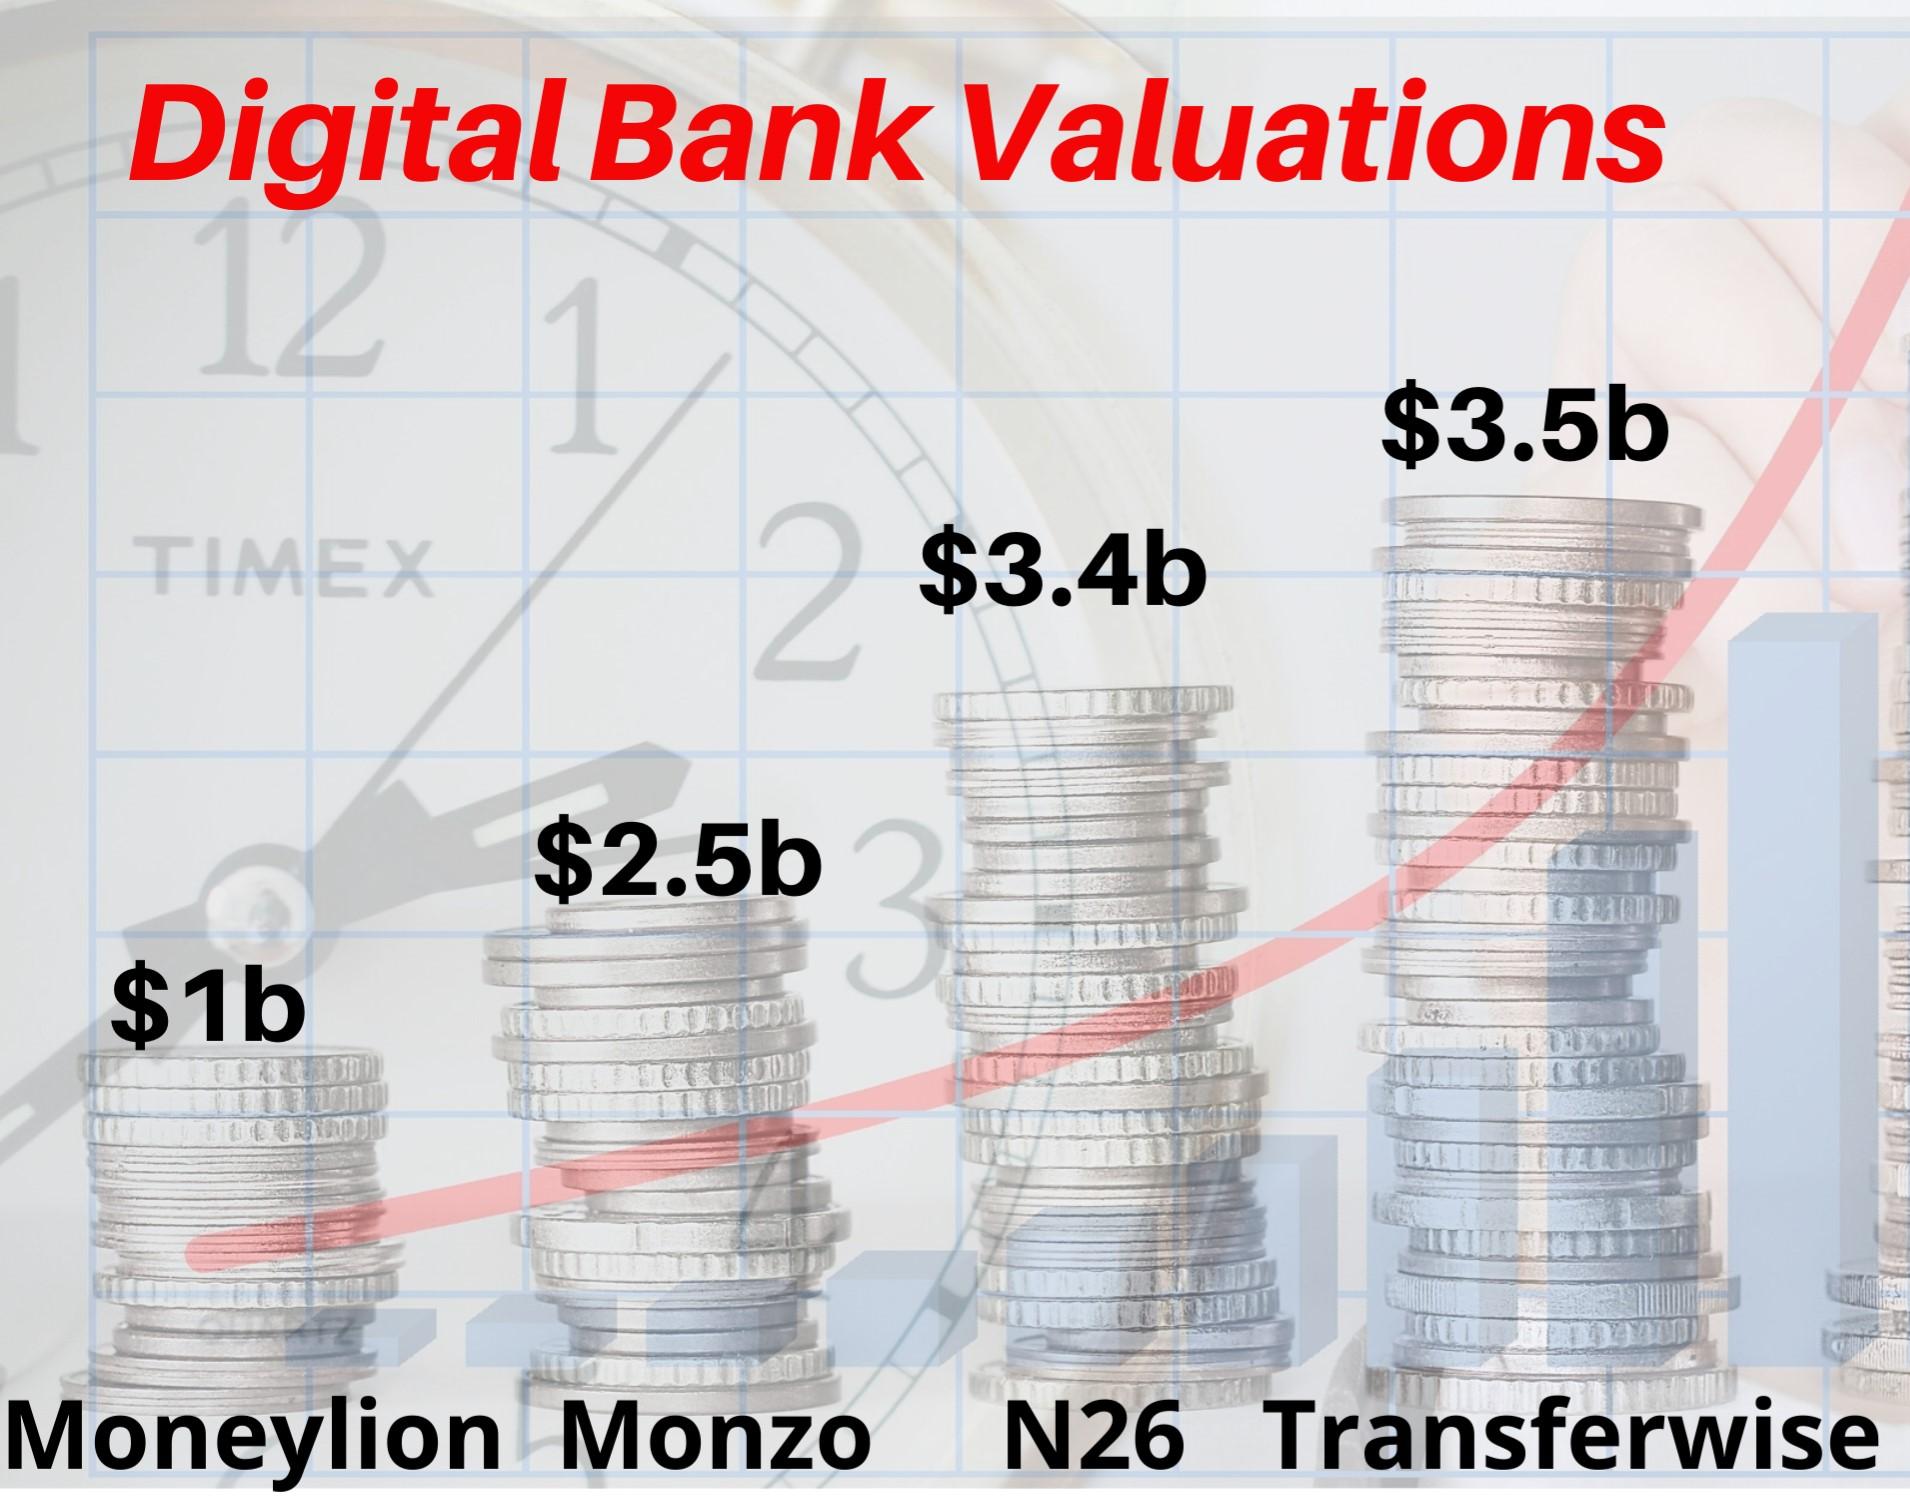 Deltec Bank, Bahamas - Computer Vision Technology Can Transform Financial Services